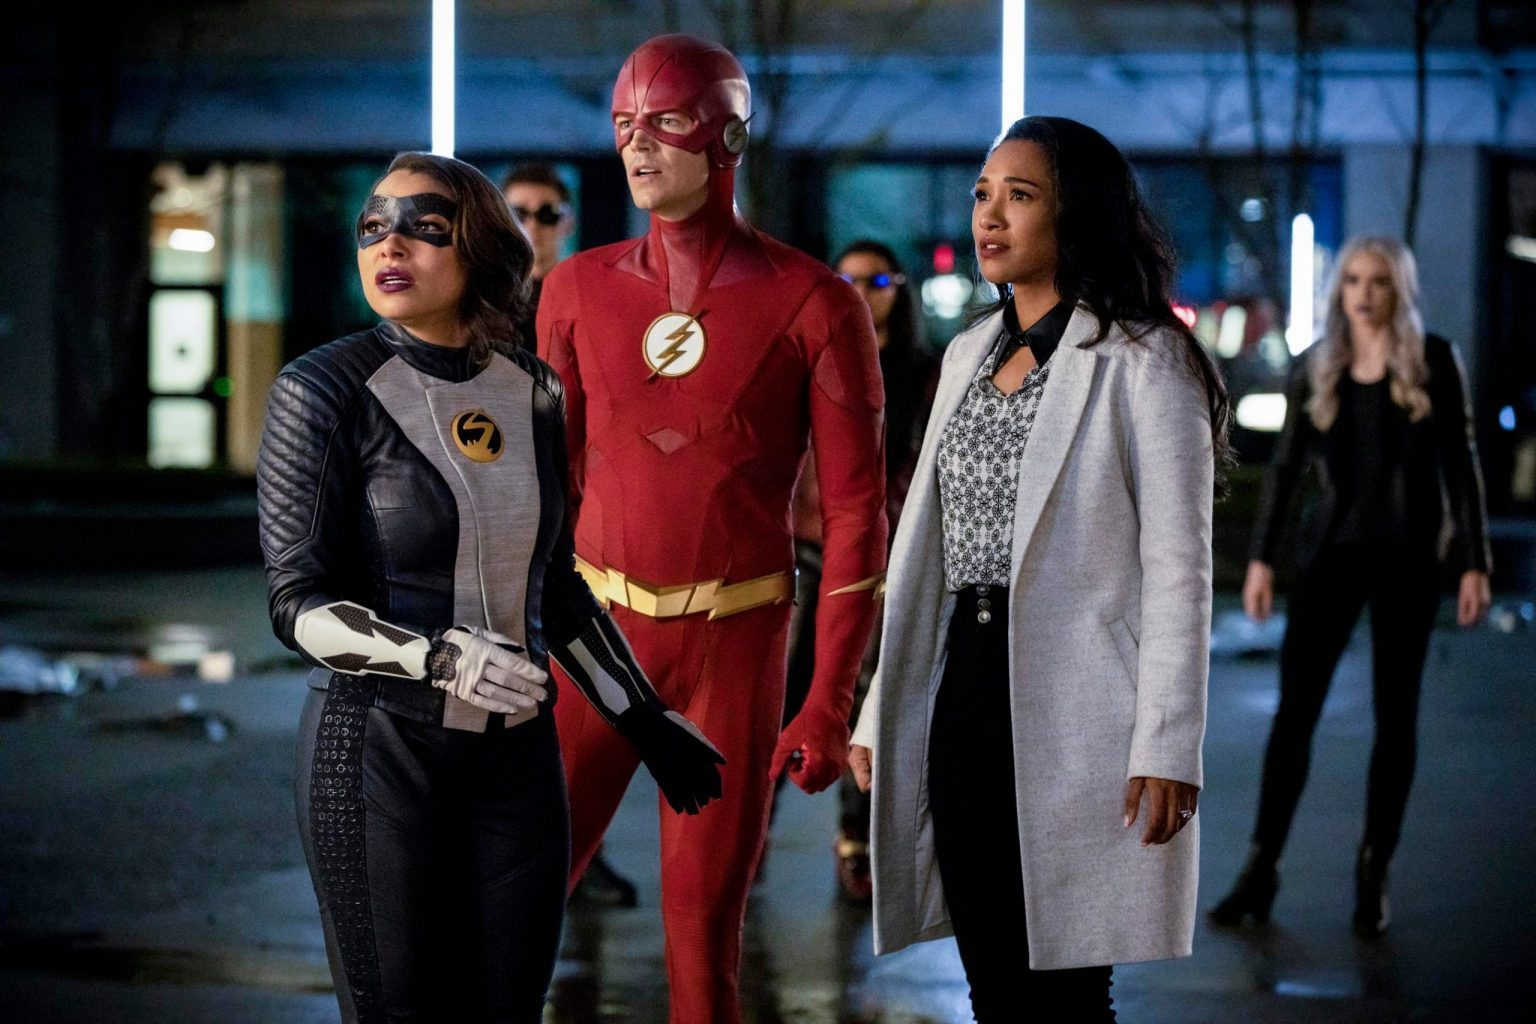 美剧《闪电侠第五季》 The Flash S5 影评-MP4吧